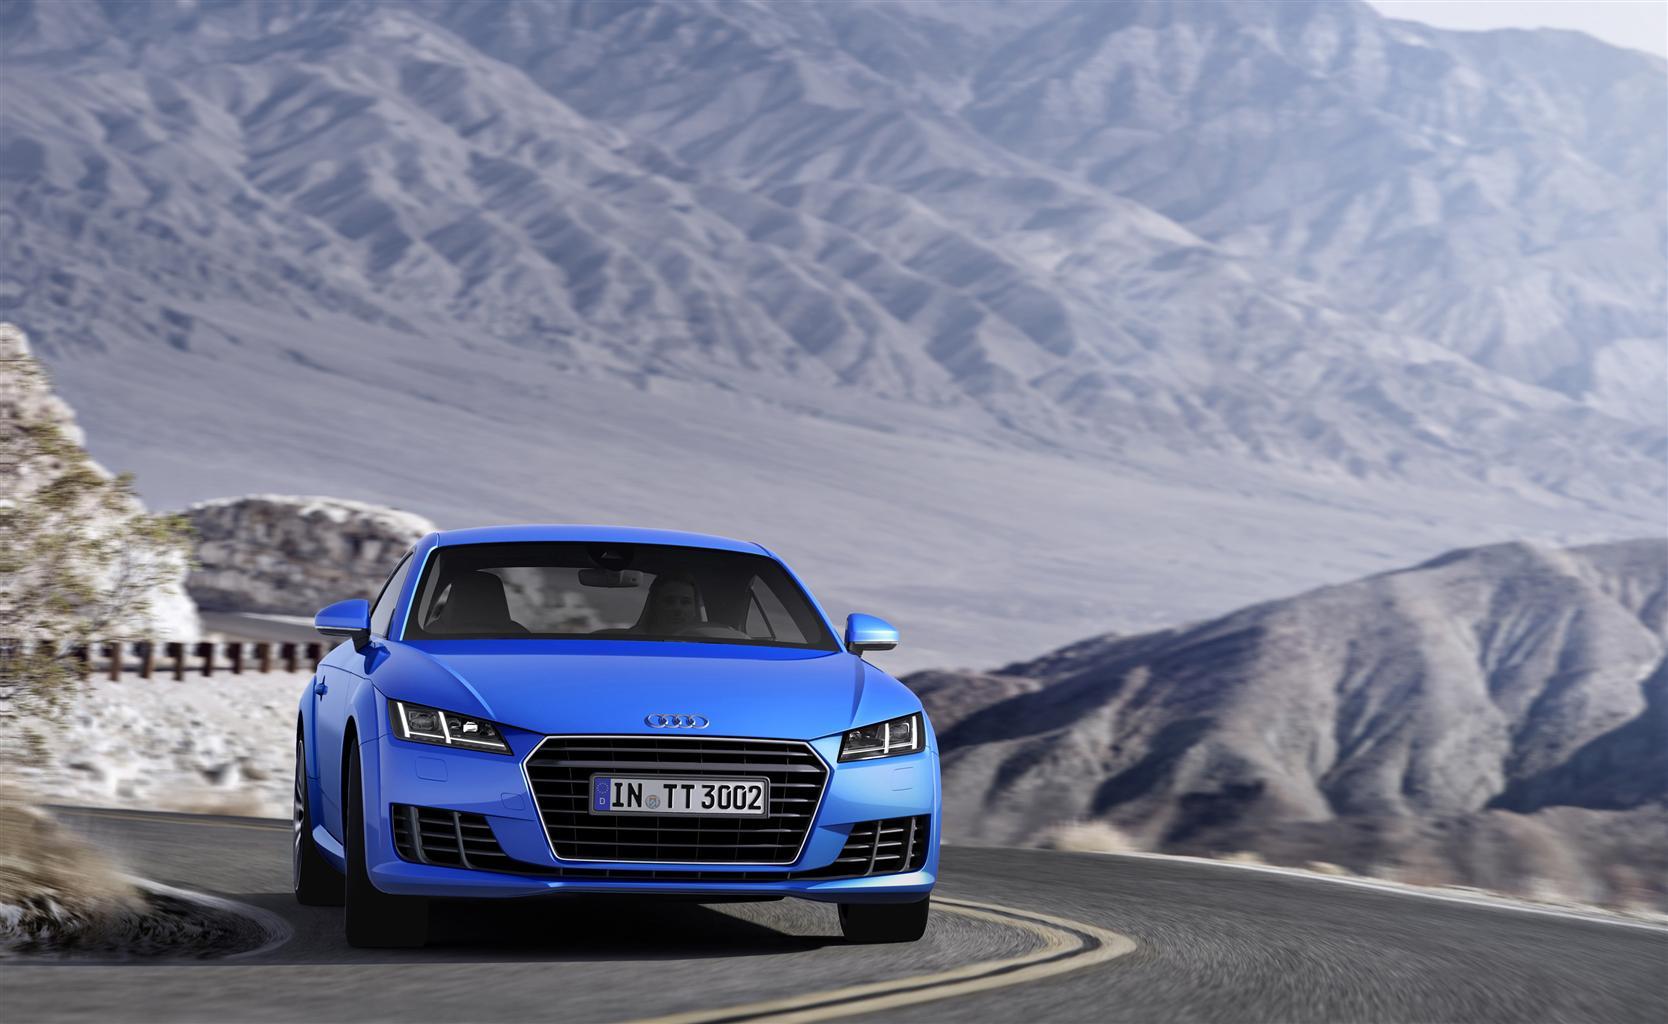 Bilancio ambientale positivo per la nuova Audi TT